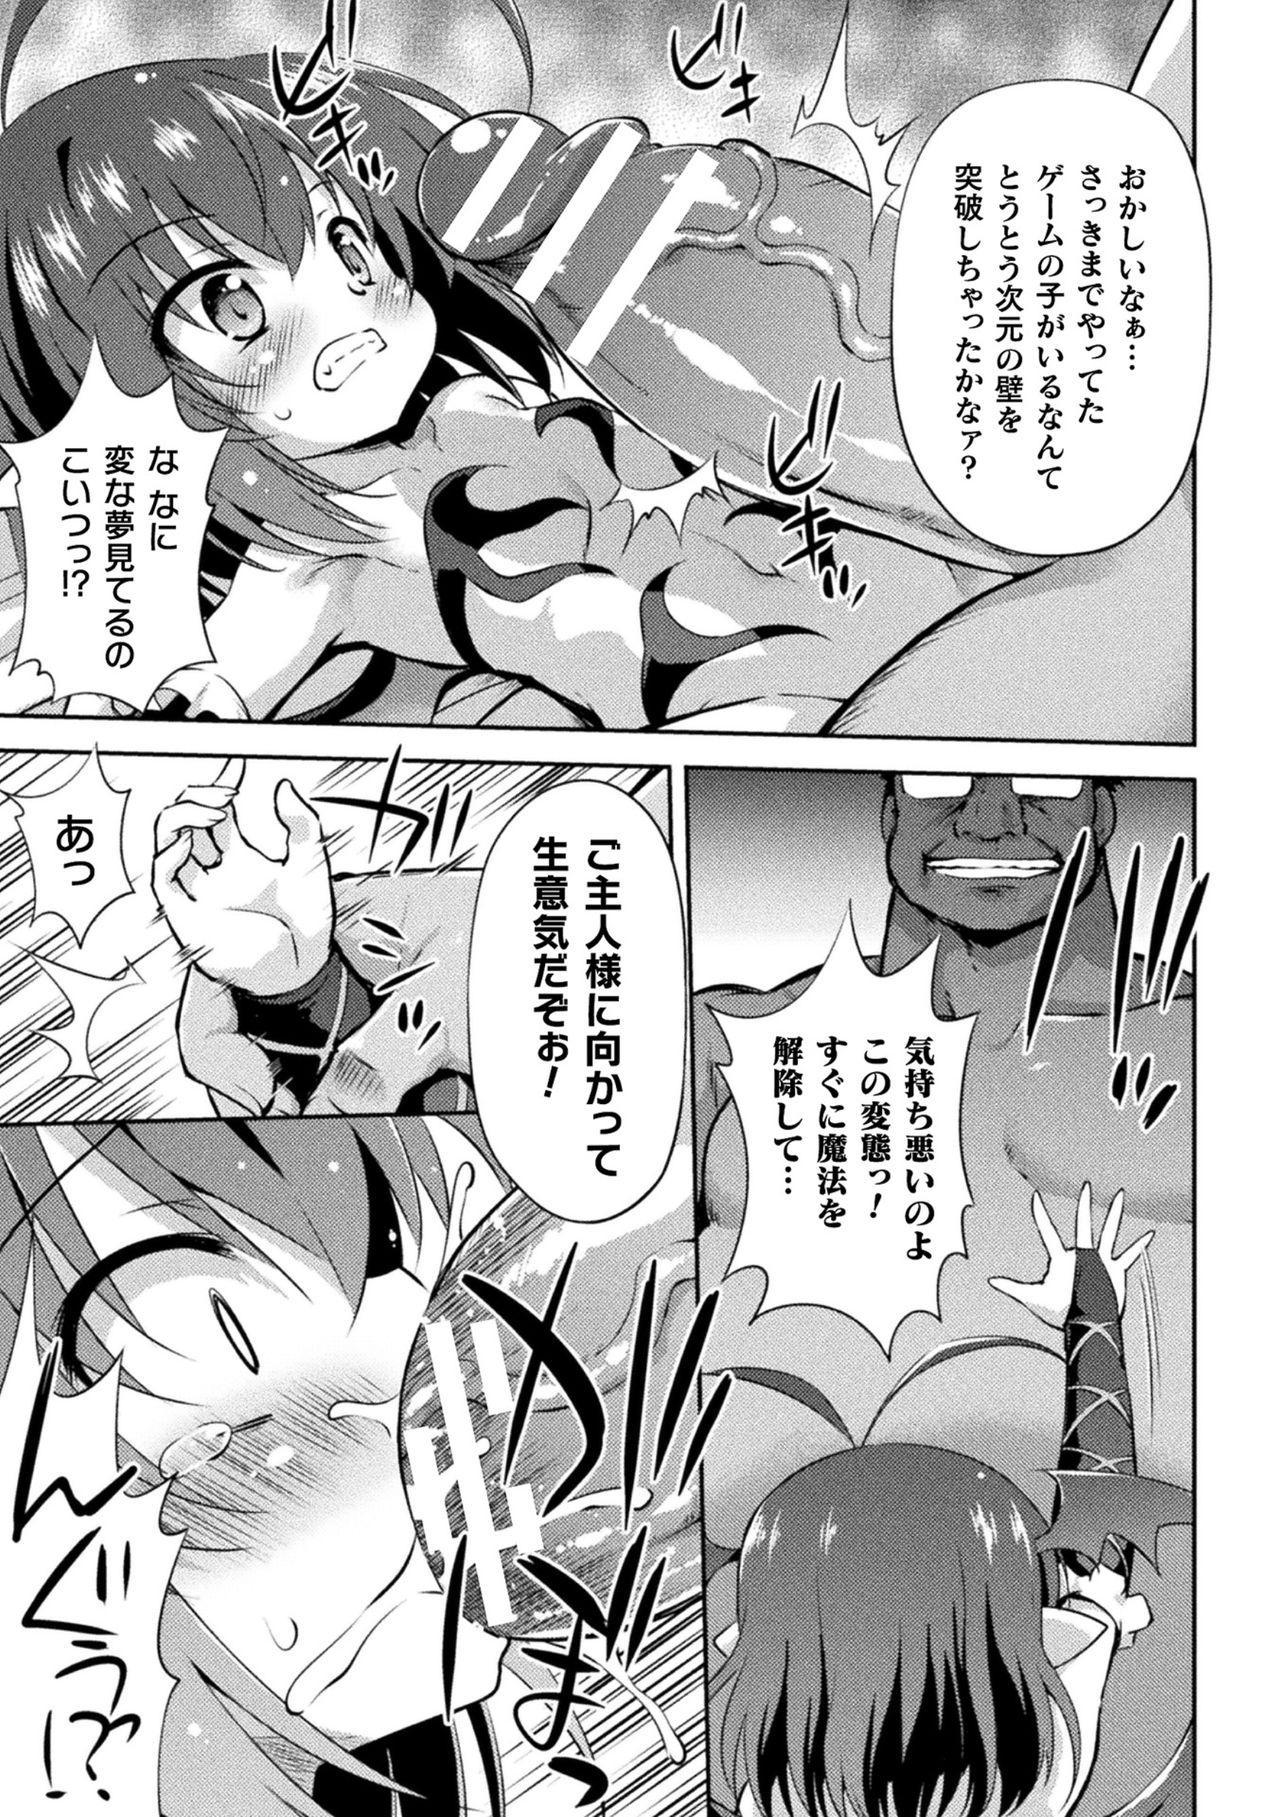 Mesuochi Little Hole 48